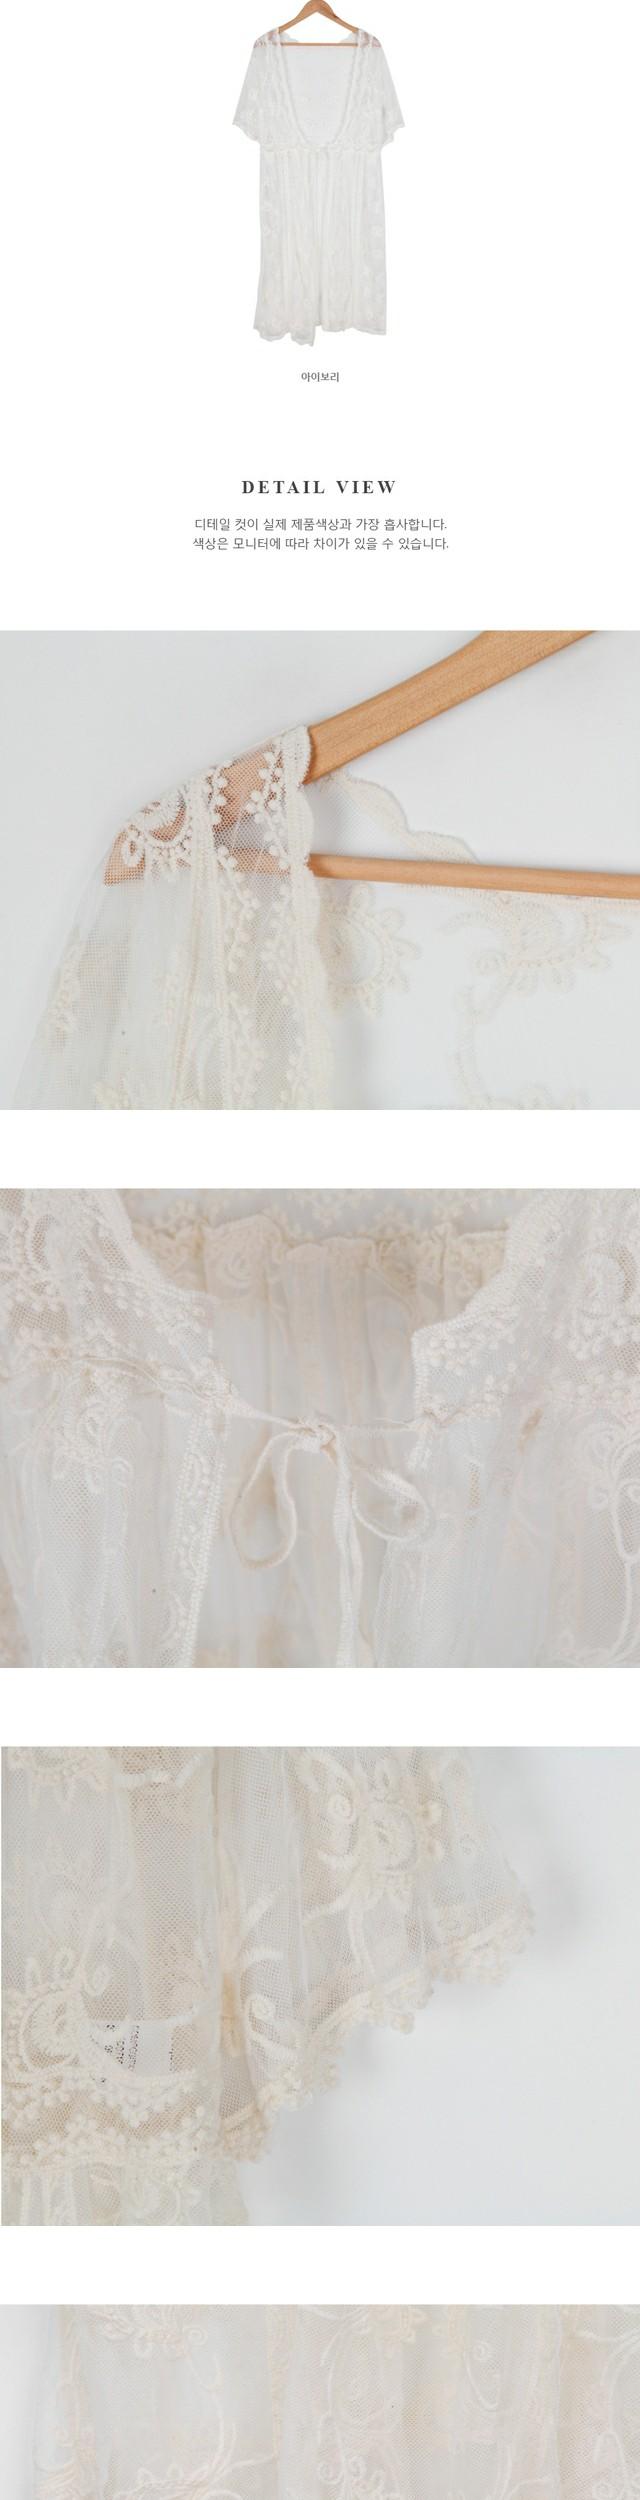 Sky Lace Robe